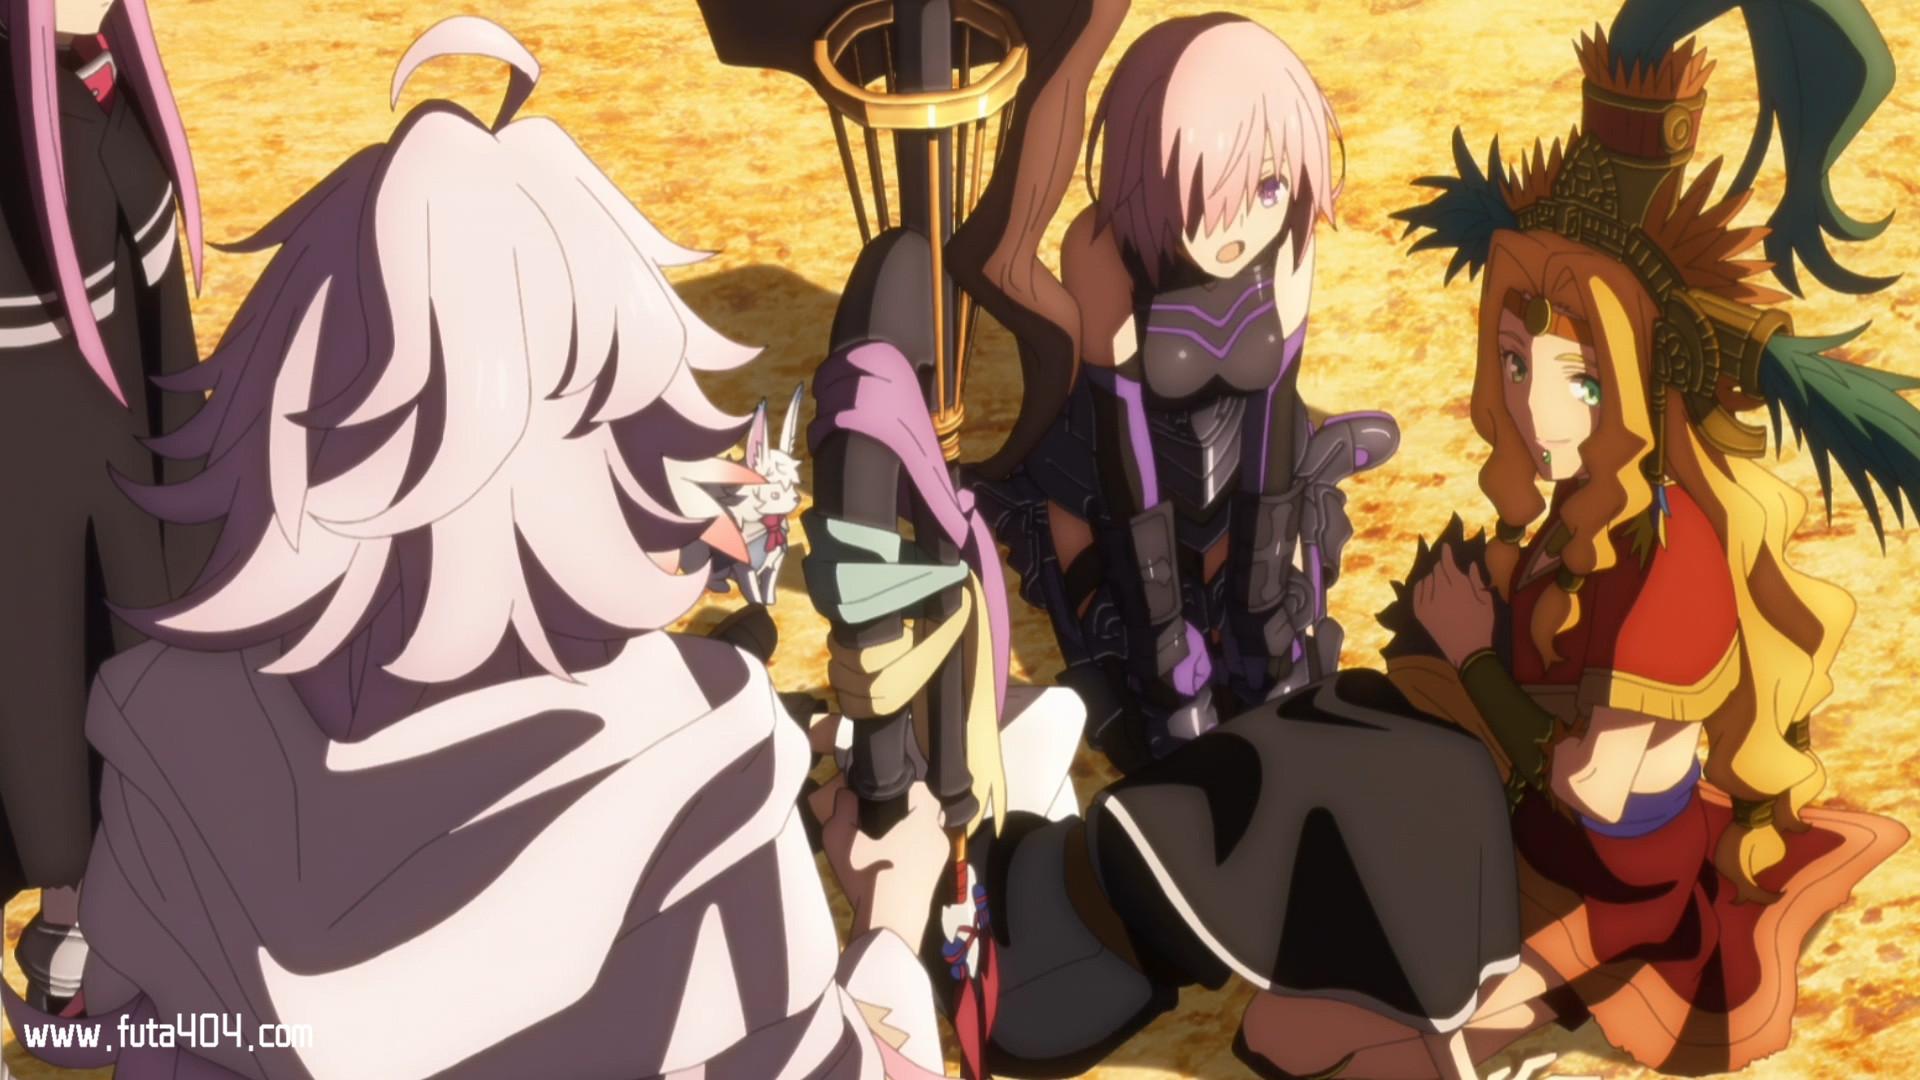 Fate Grand Order 绝对魔兽战线巴比伦尼亚 第11话 Fate Grand Order 动画在线 第1张